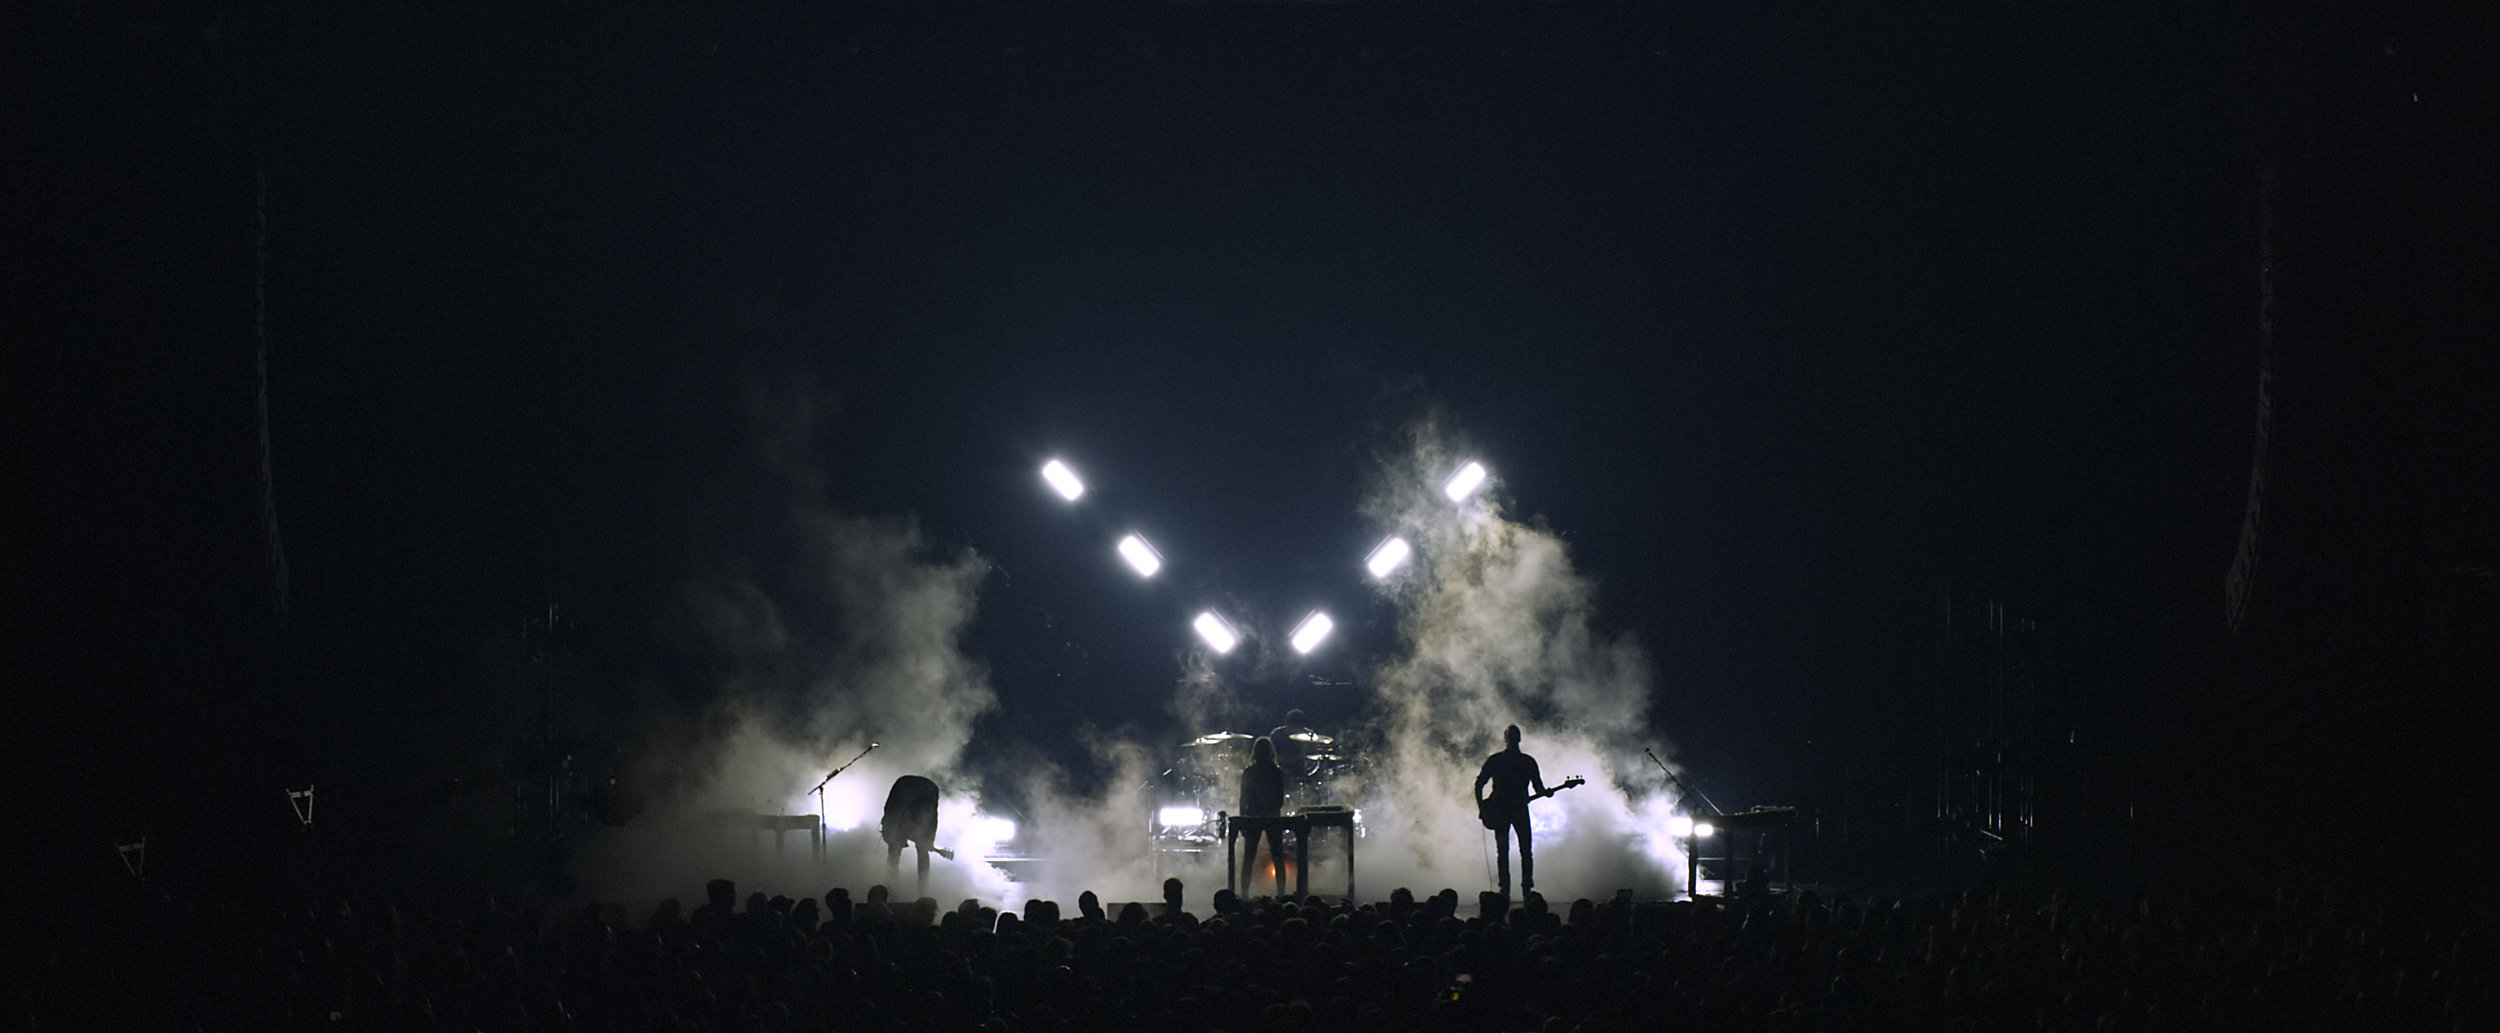 Band-Twilight-001.jpg